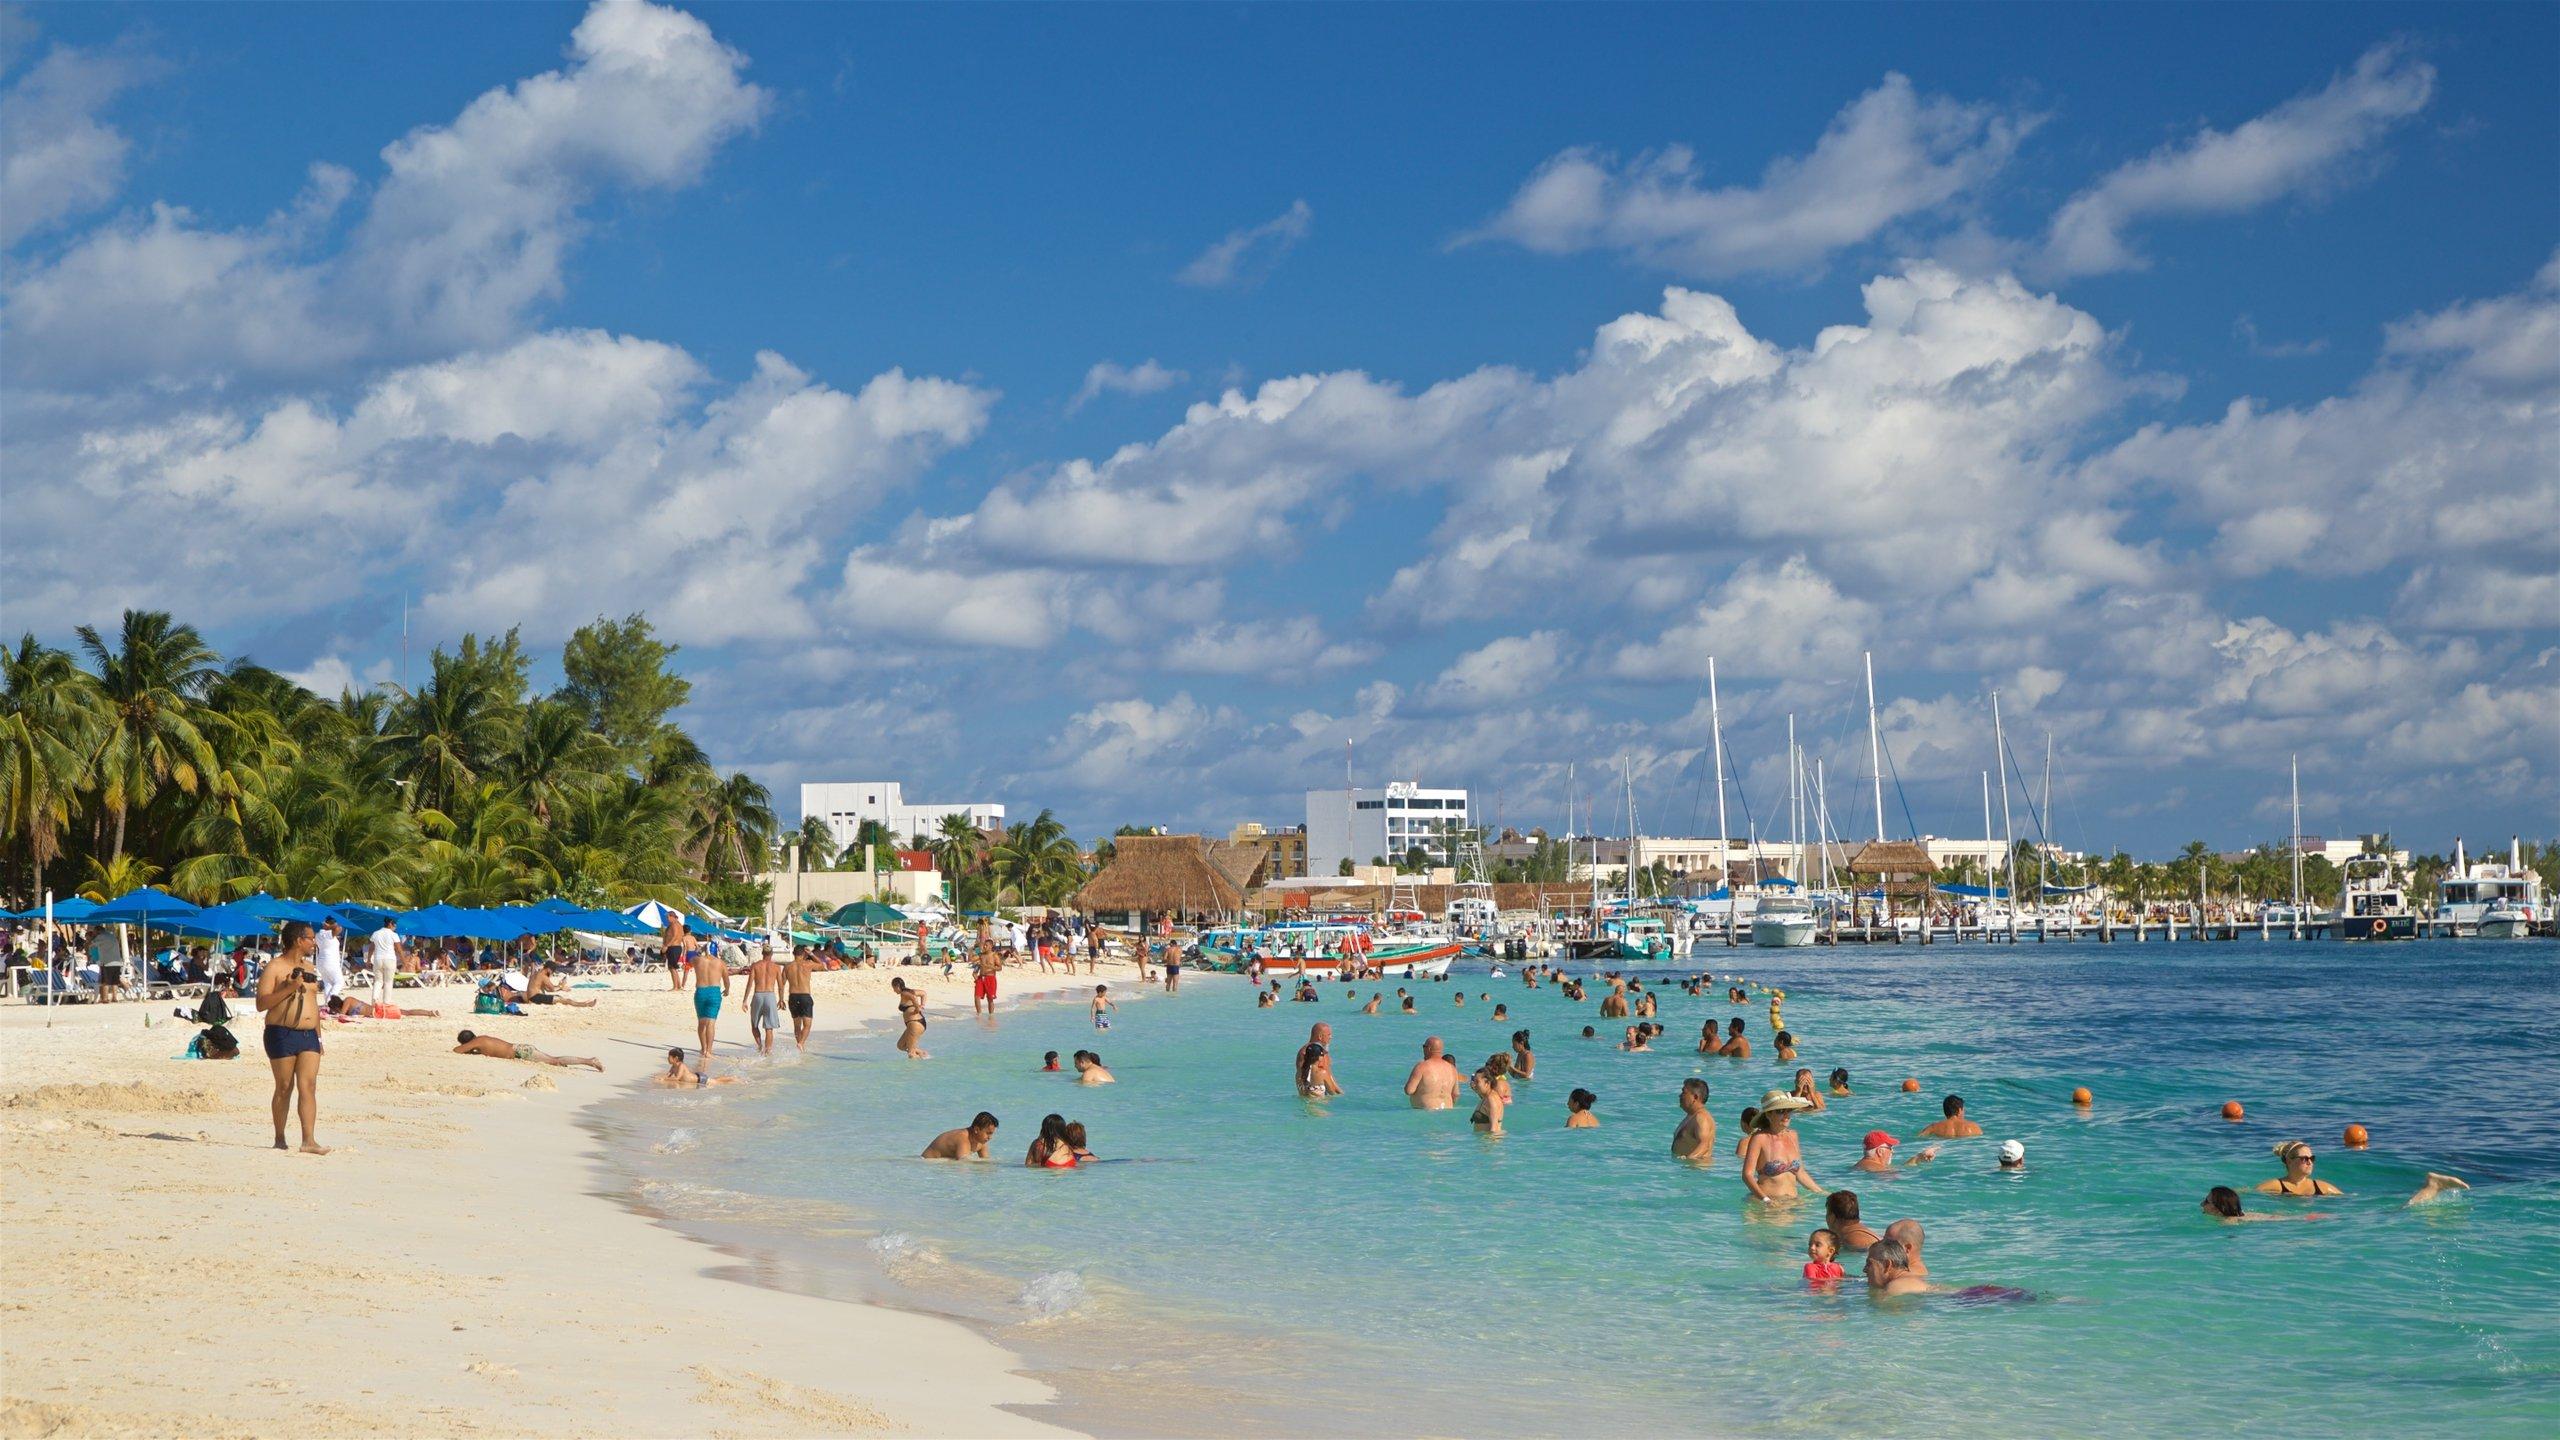 Norte Beach, Isla Mujeres, Quintana Roo, Mexico